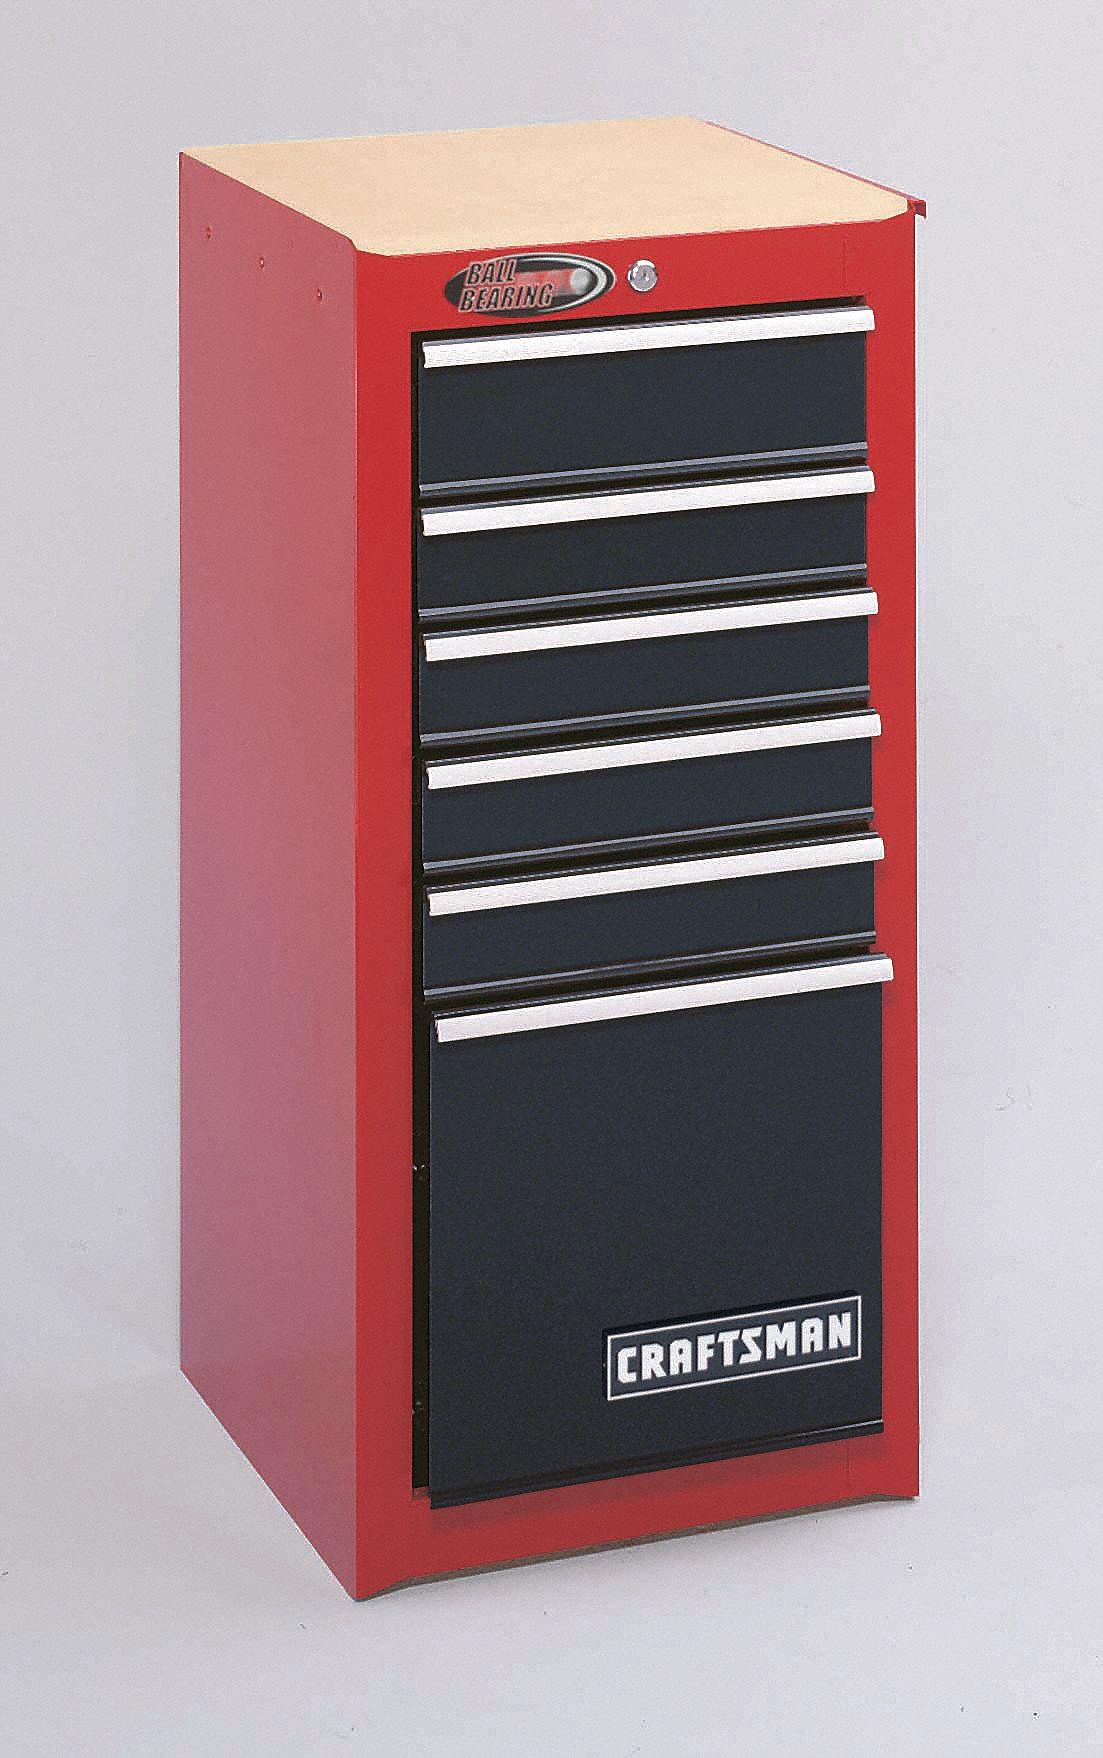 Craftsman Red Black Side Cabinet 35 1 4 H X 15 3 W 18 D Number Of Drawers 6 16w858 9 81335 Grainger